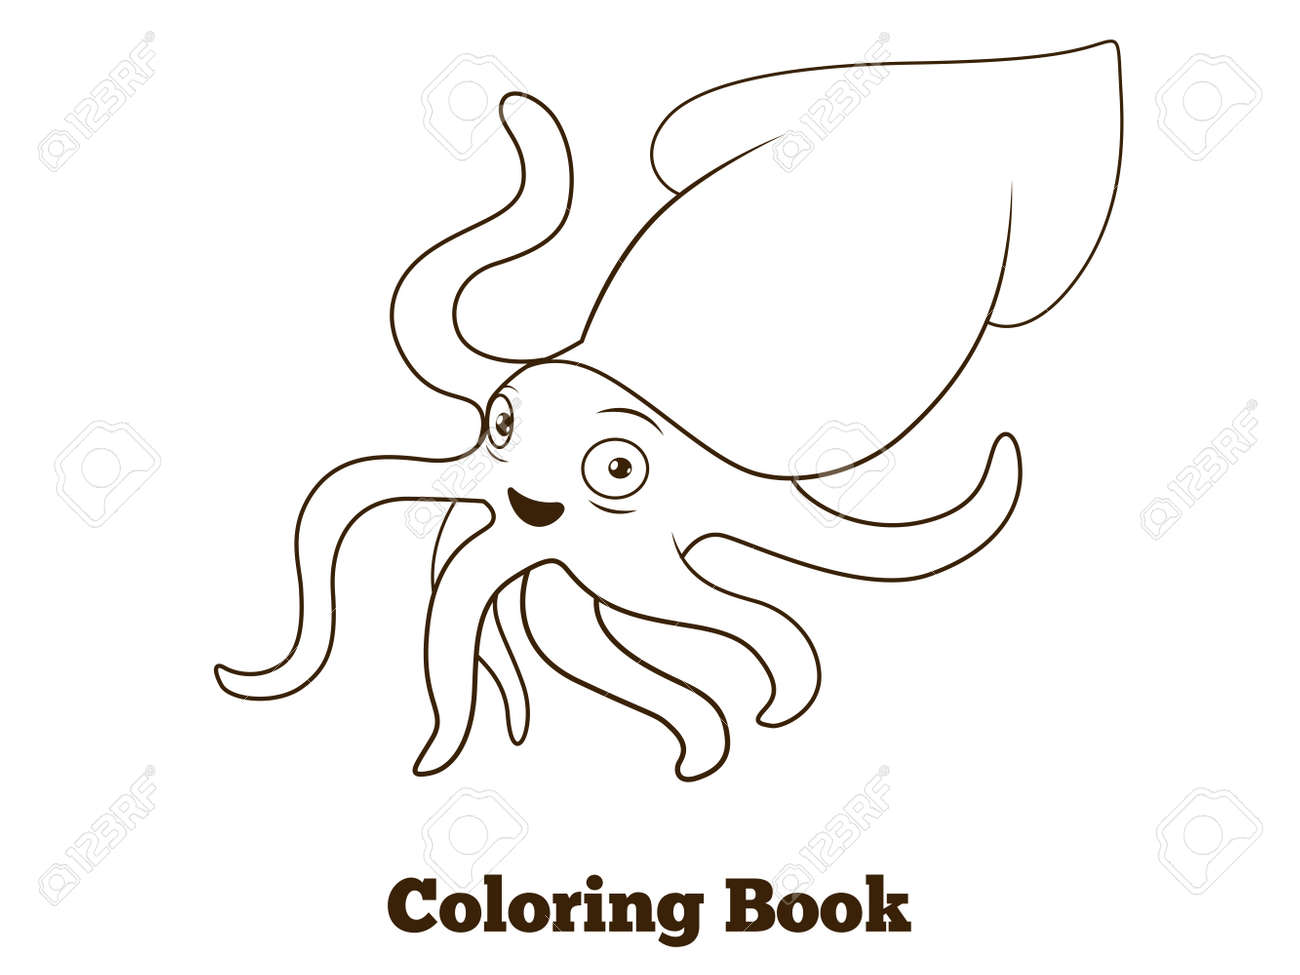 Para Colorear Un Pez Dibujo de Pez payaso para Colorear ...